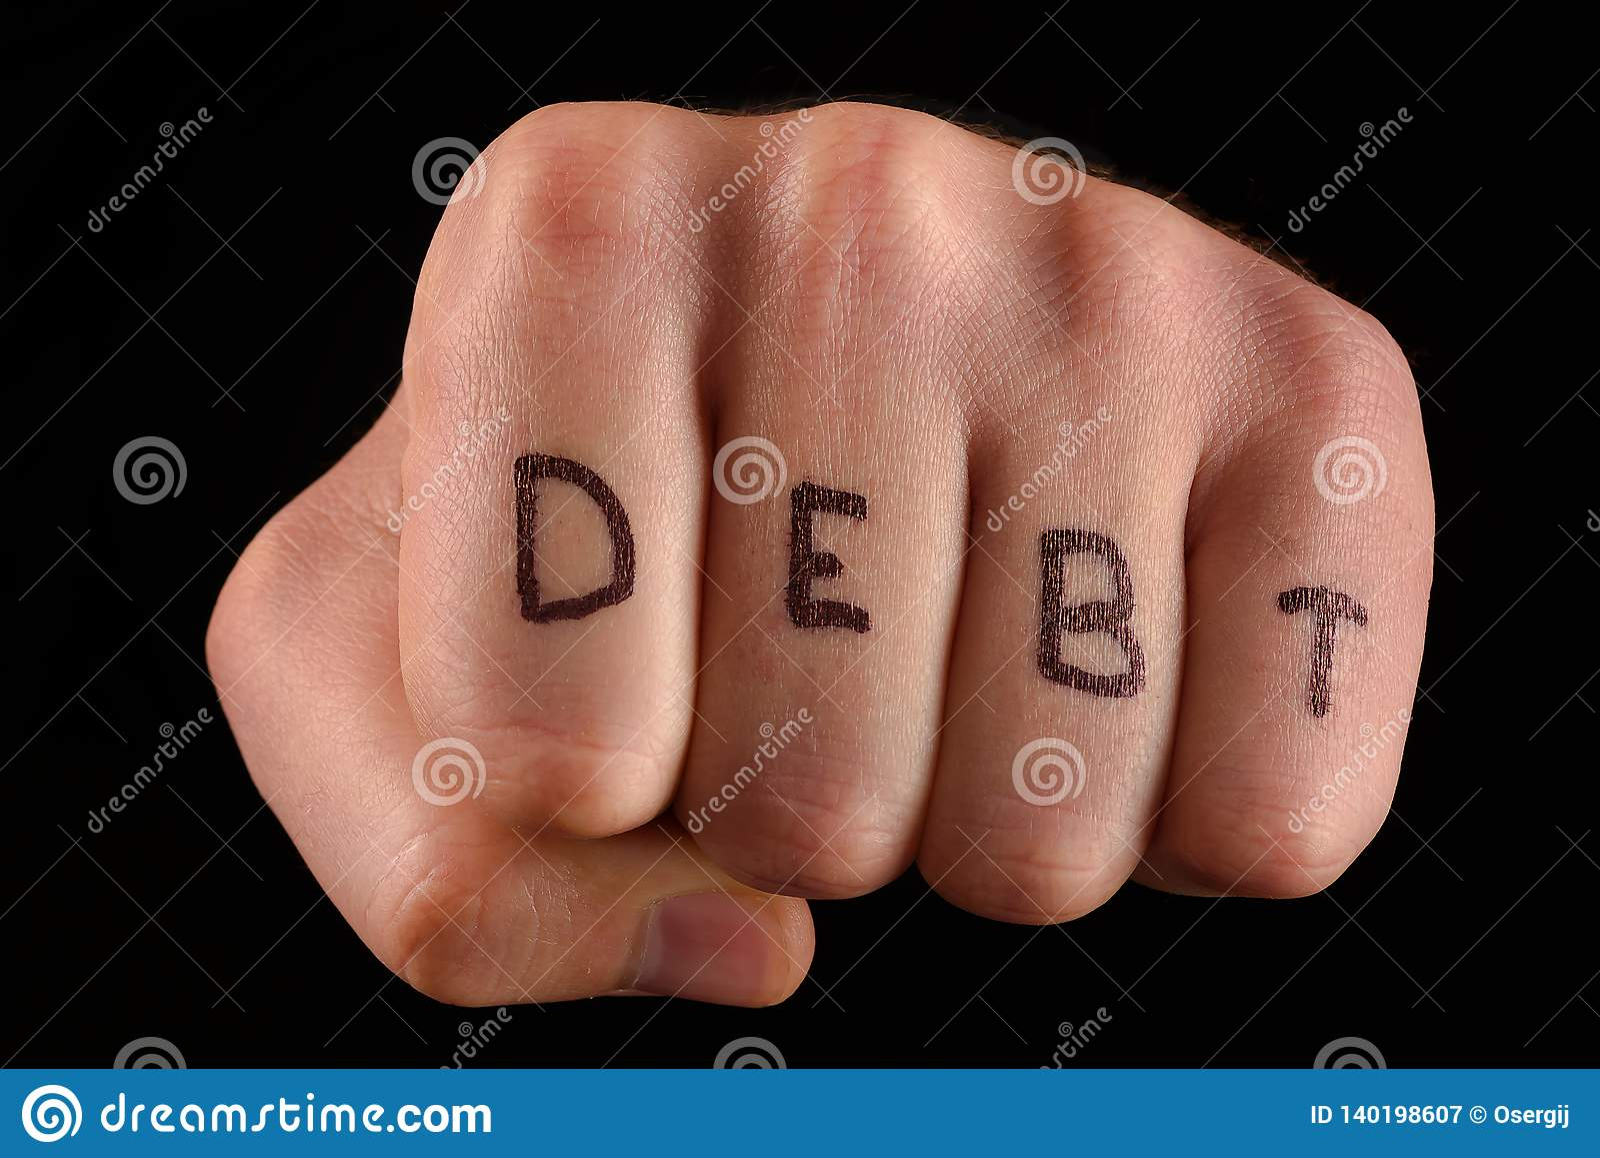 Fist on black background, inscription DEBT